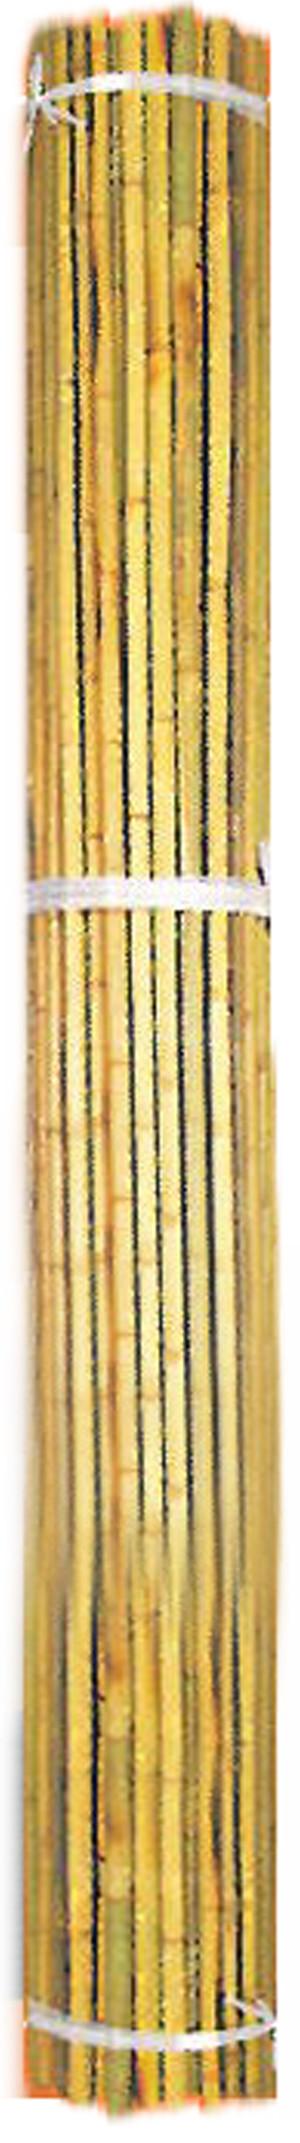 Bond Natural Bamboo Stake Bulk Brown 250ea/.5Inx6 ft